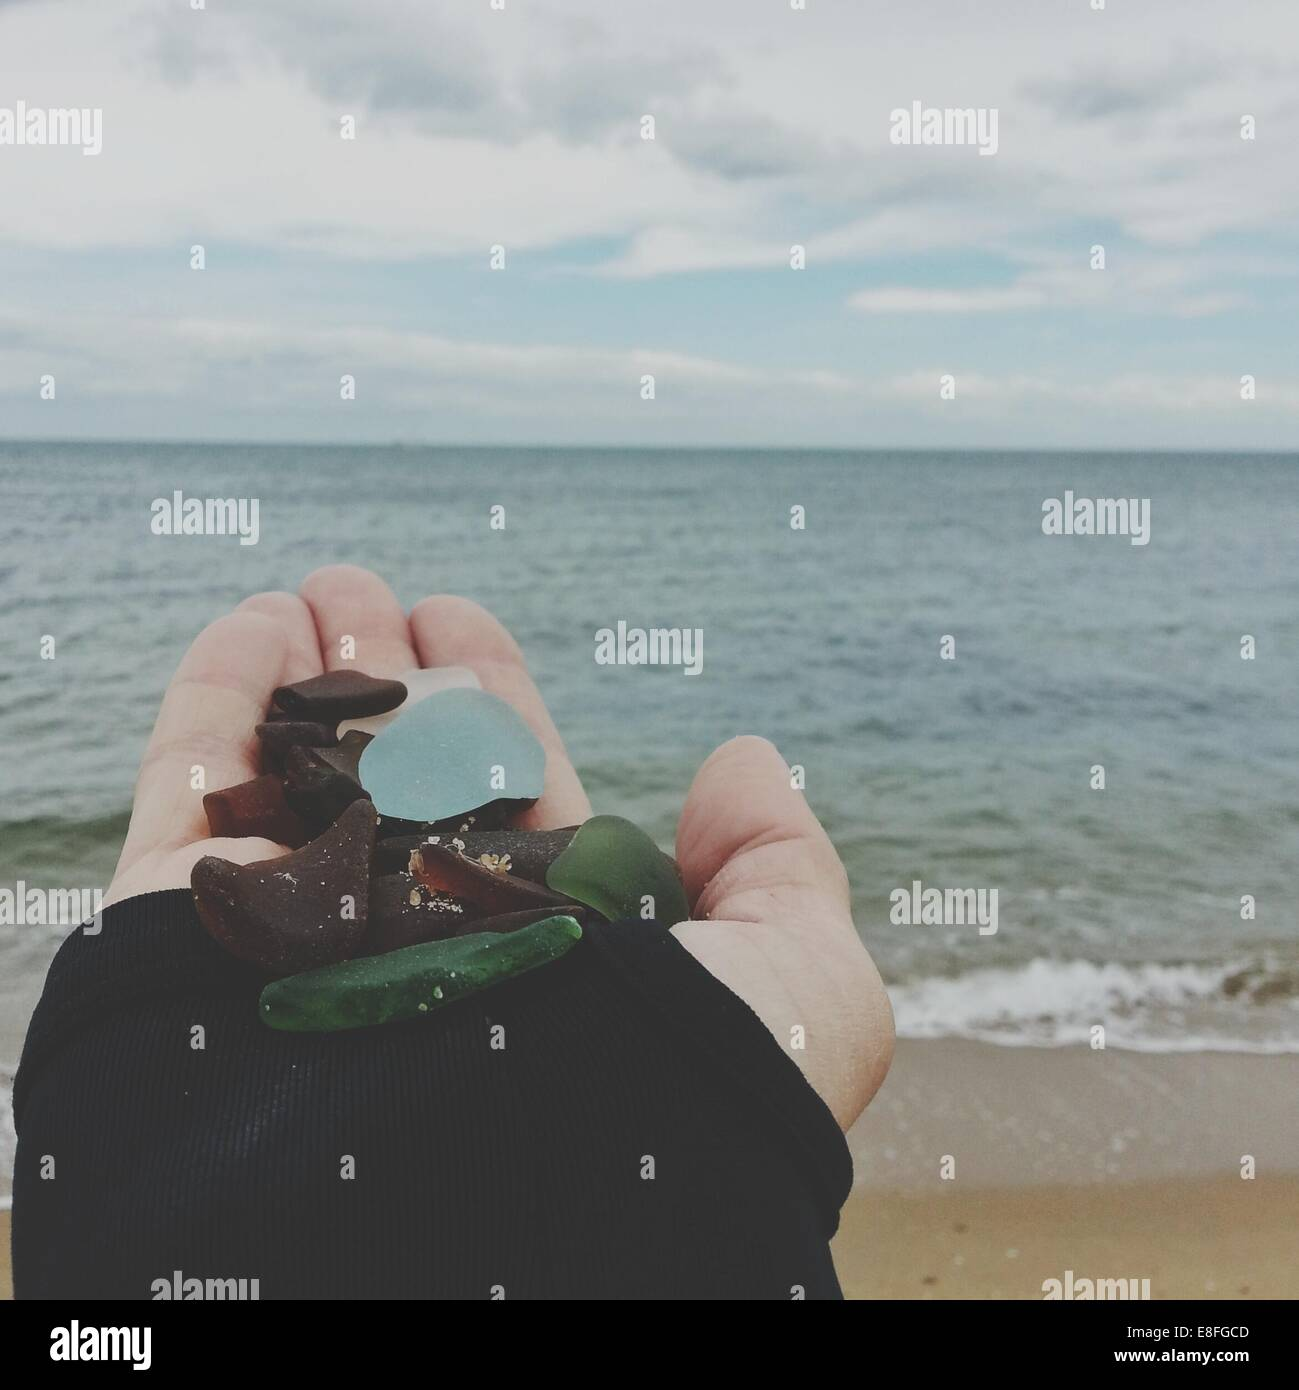 Woman's hand holding galets sur la plage Photo Stock